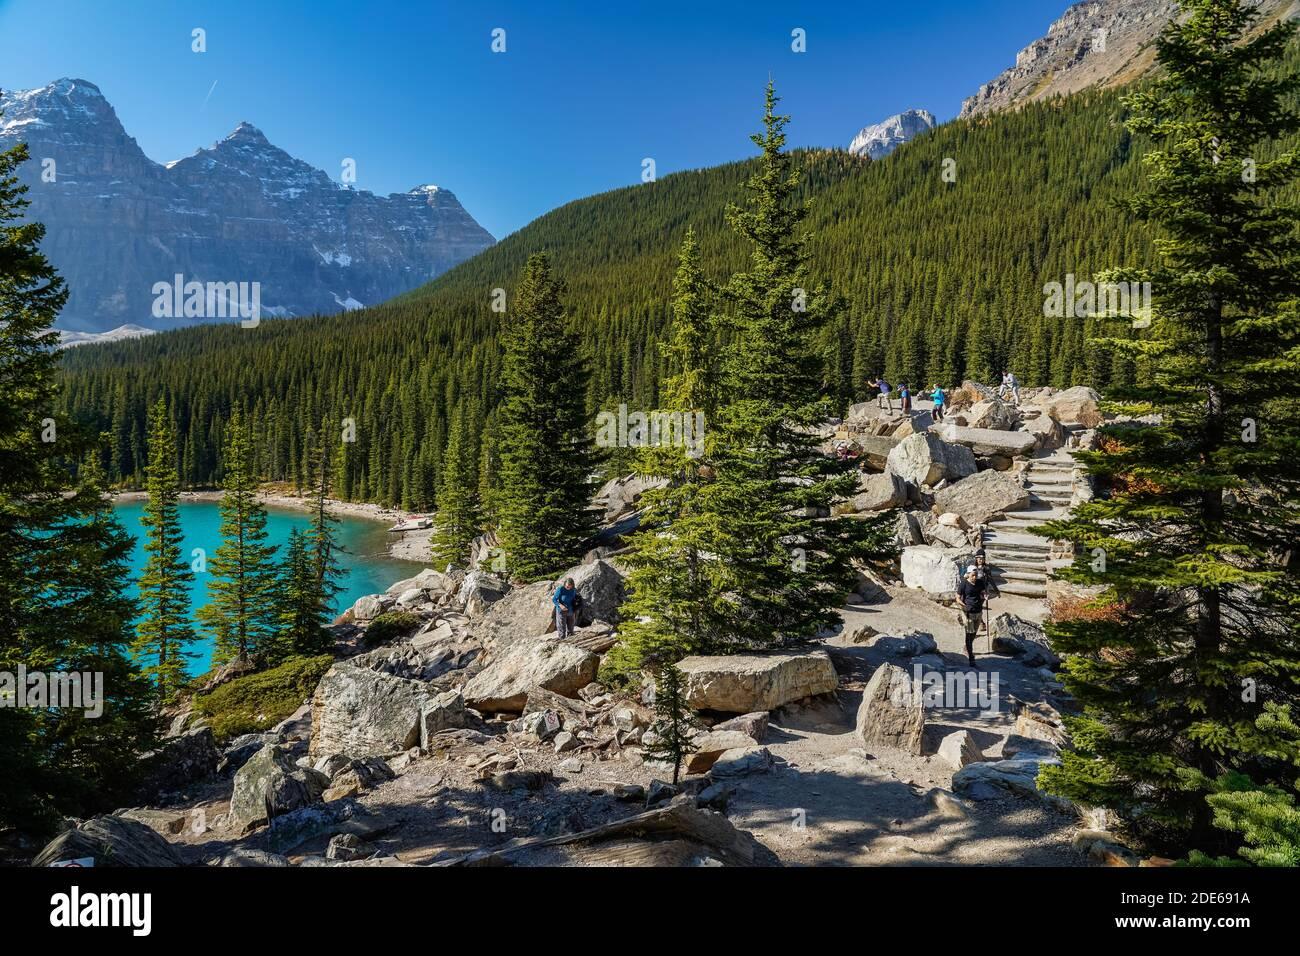 Moraine Lake Rockpile Trail in summer sunny day morning, Tourists enjoying the beautiful scenery. Banff National Park, Canadian Rockies, Alberta Stock Photo